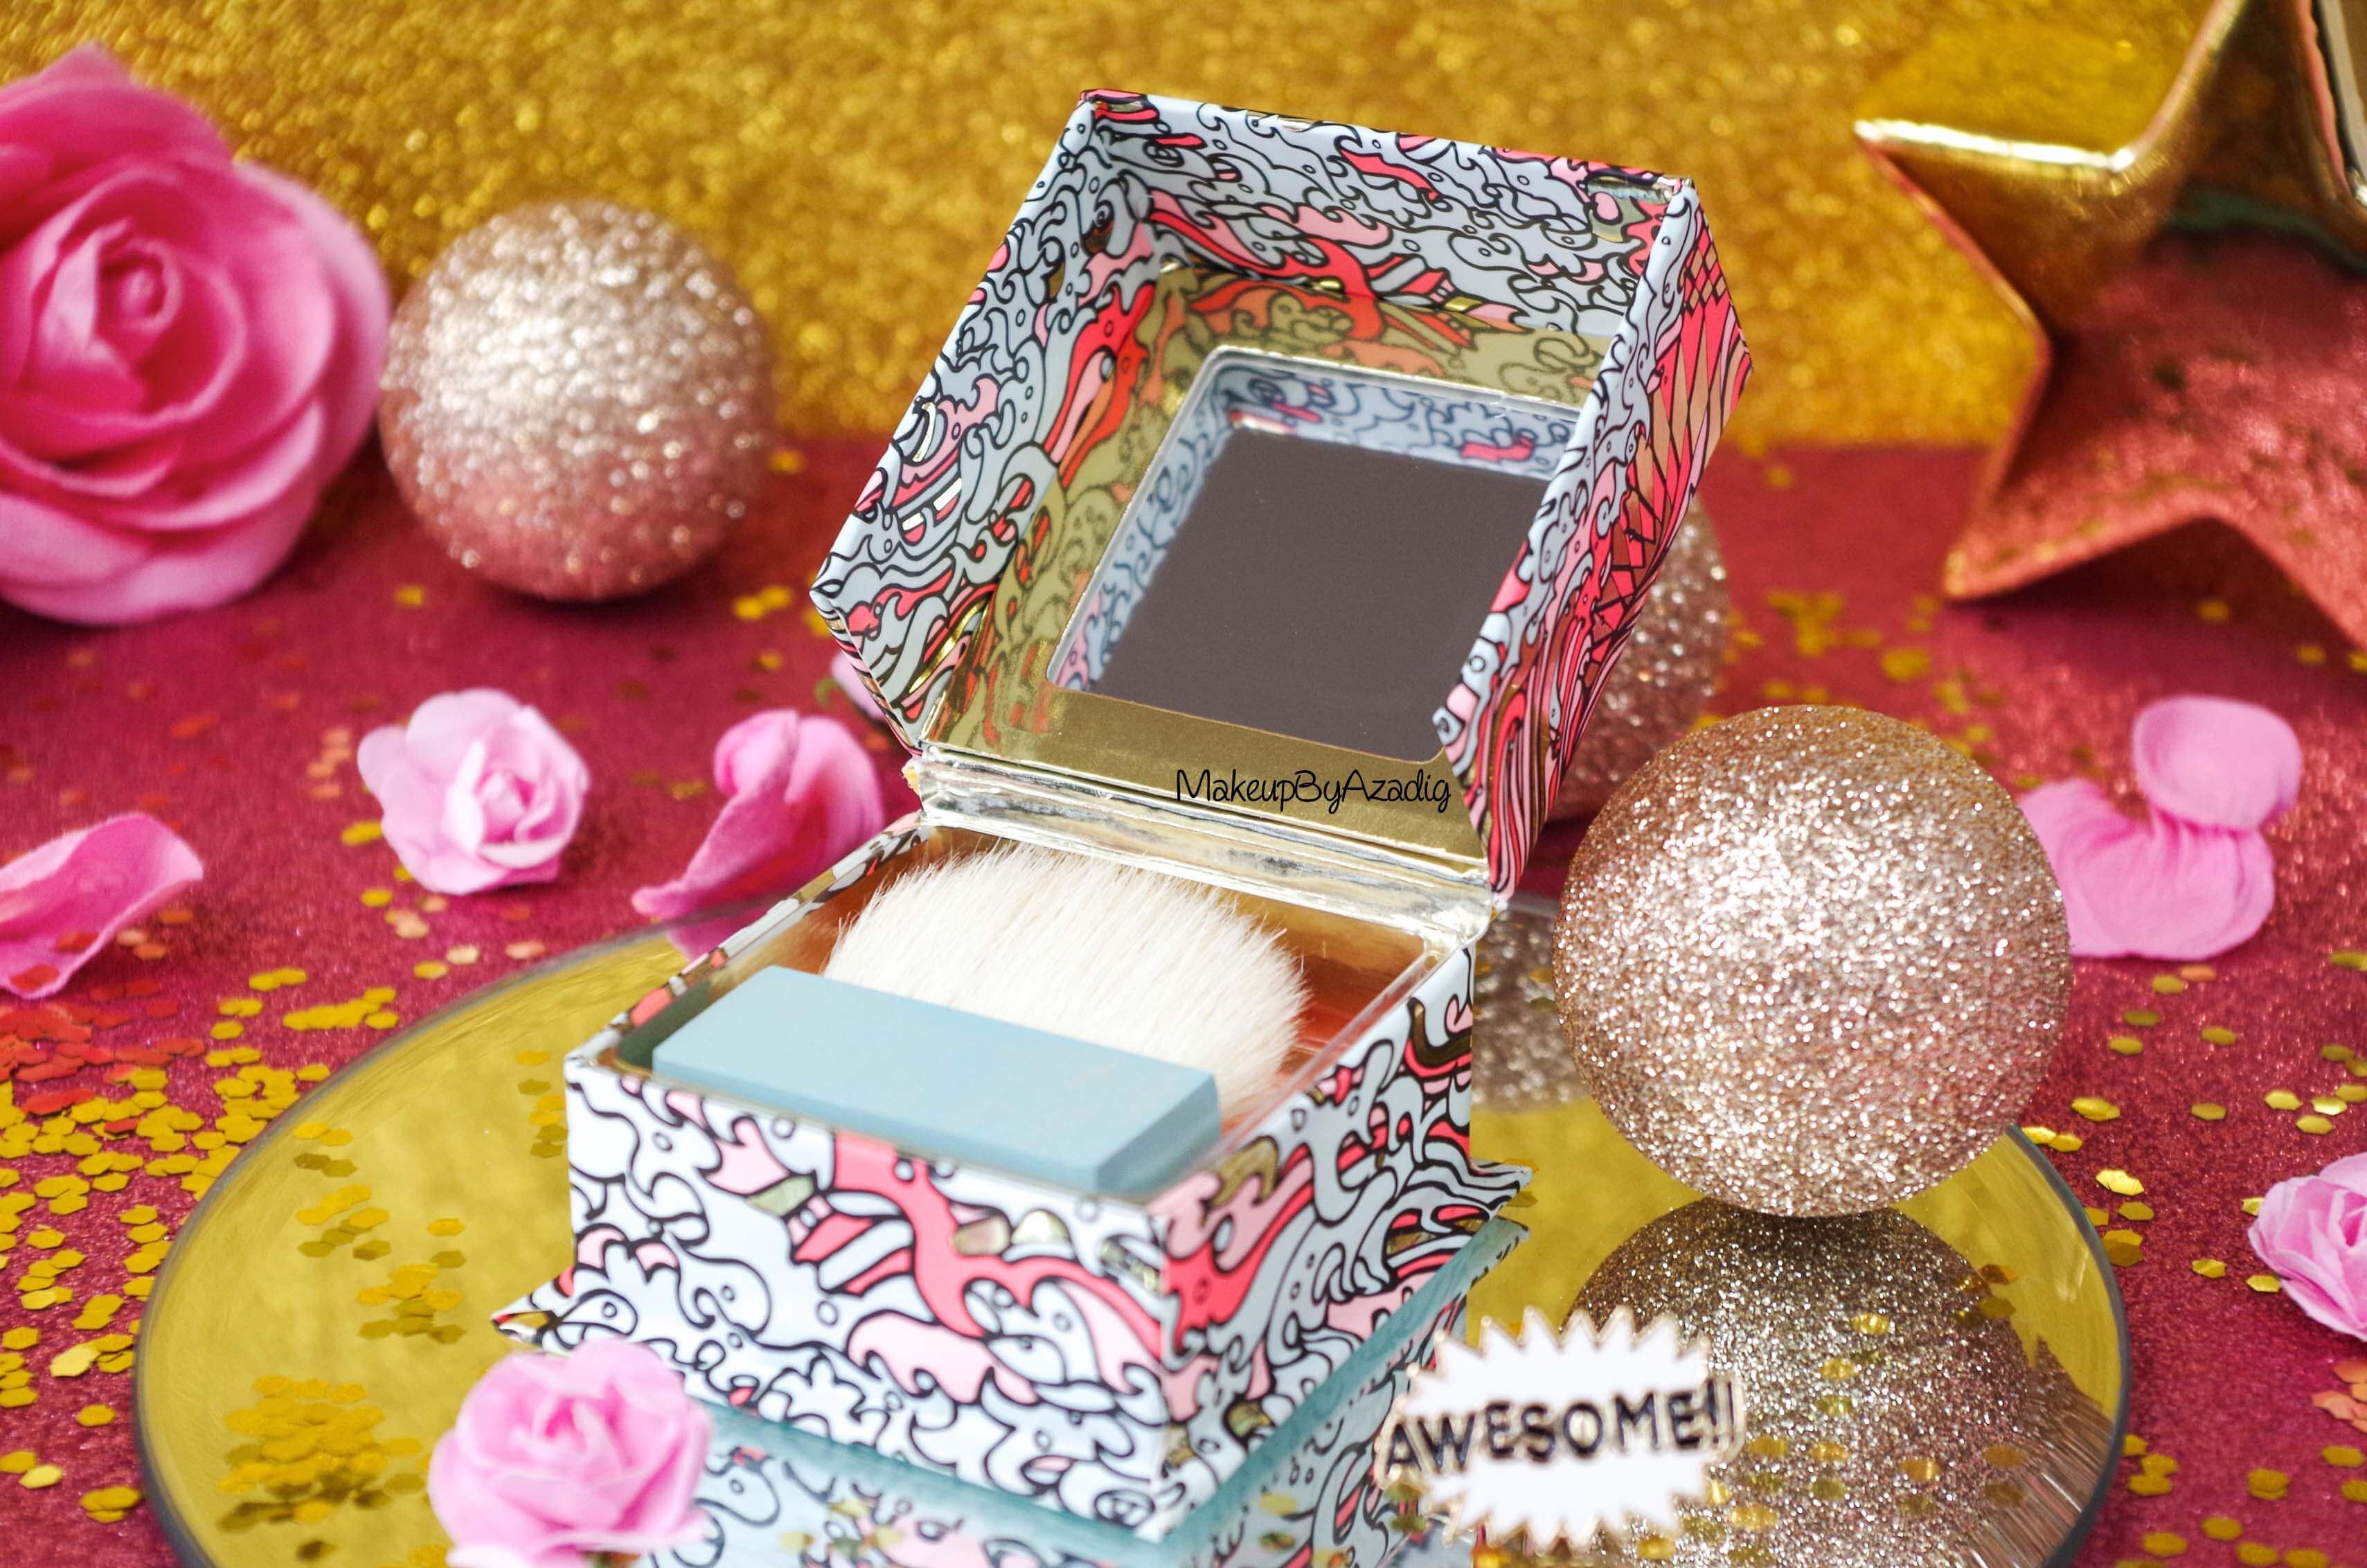 mirror-revue-review-blush-benefit-galifornia-san-francisco-sunny-golden-pink-blush-avis-prix-sephora-makeupbyazadig-coachella